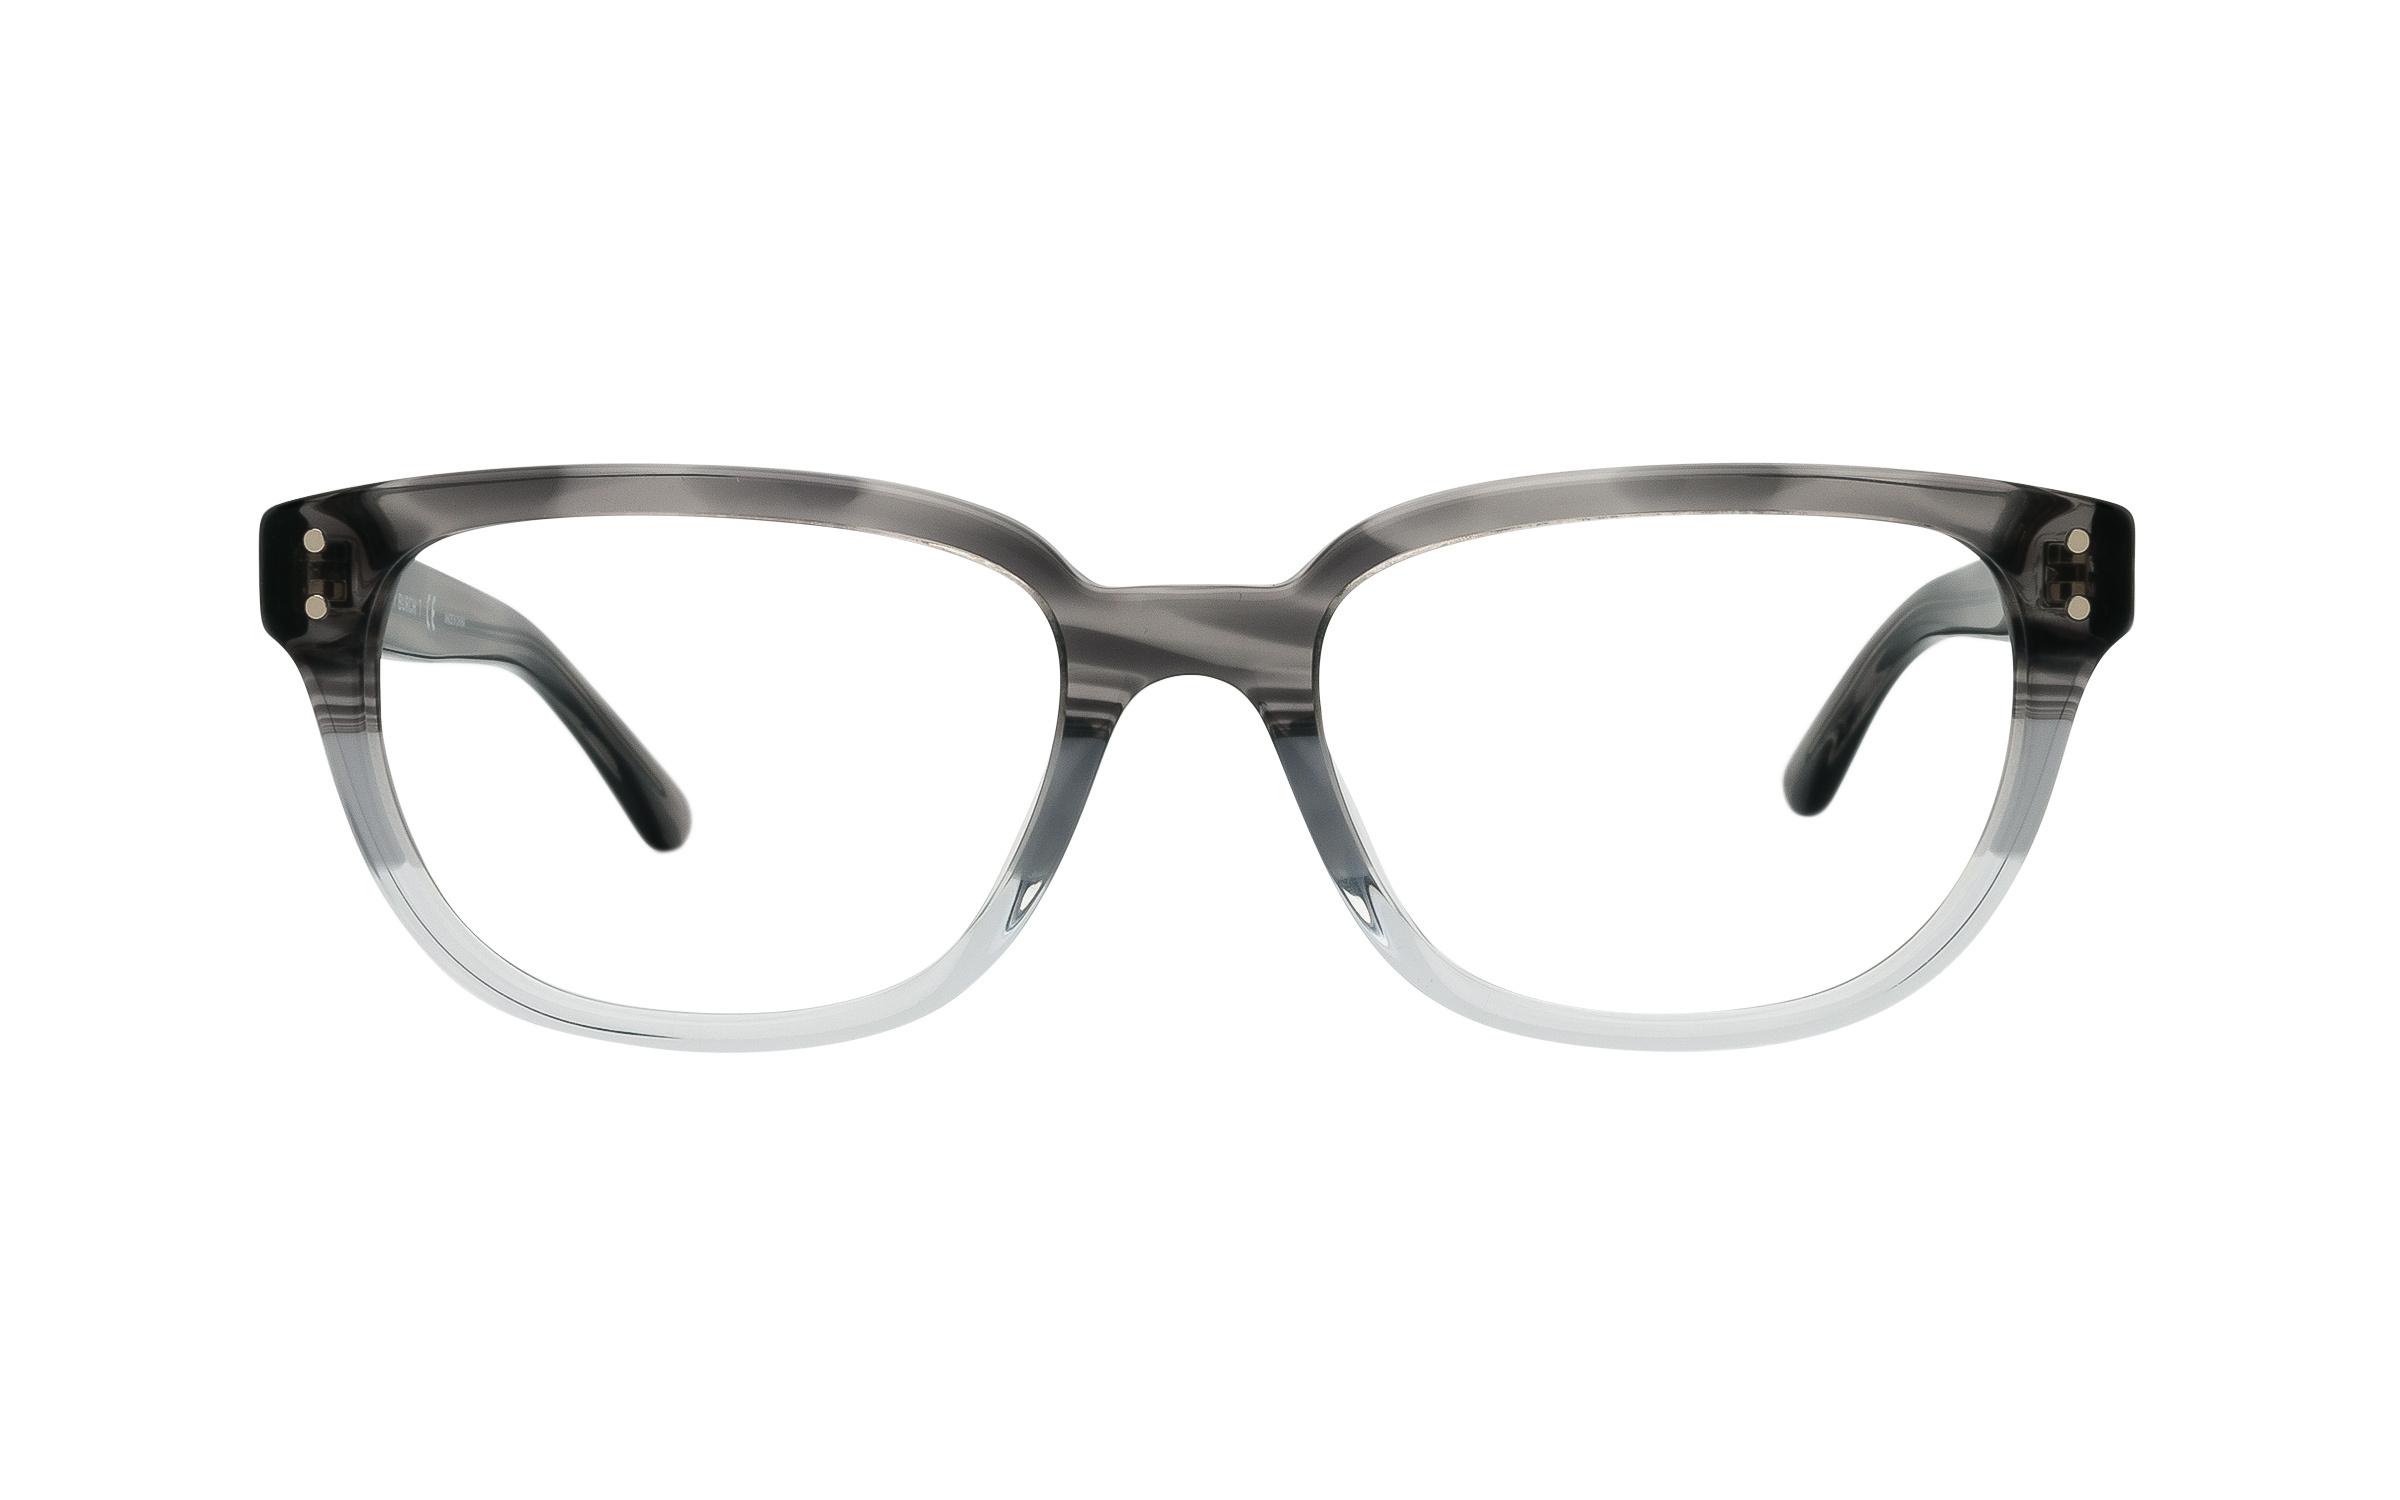 coastal.com - Tory Burch TY2104U 1785 (52) Eyeglasses and Frame in Gradient Grey | Acetate/Metal – Online Coastal 182.00 USD